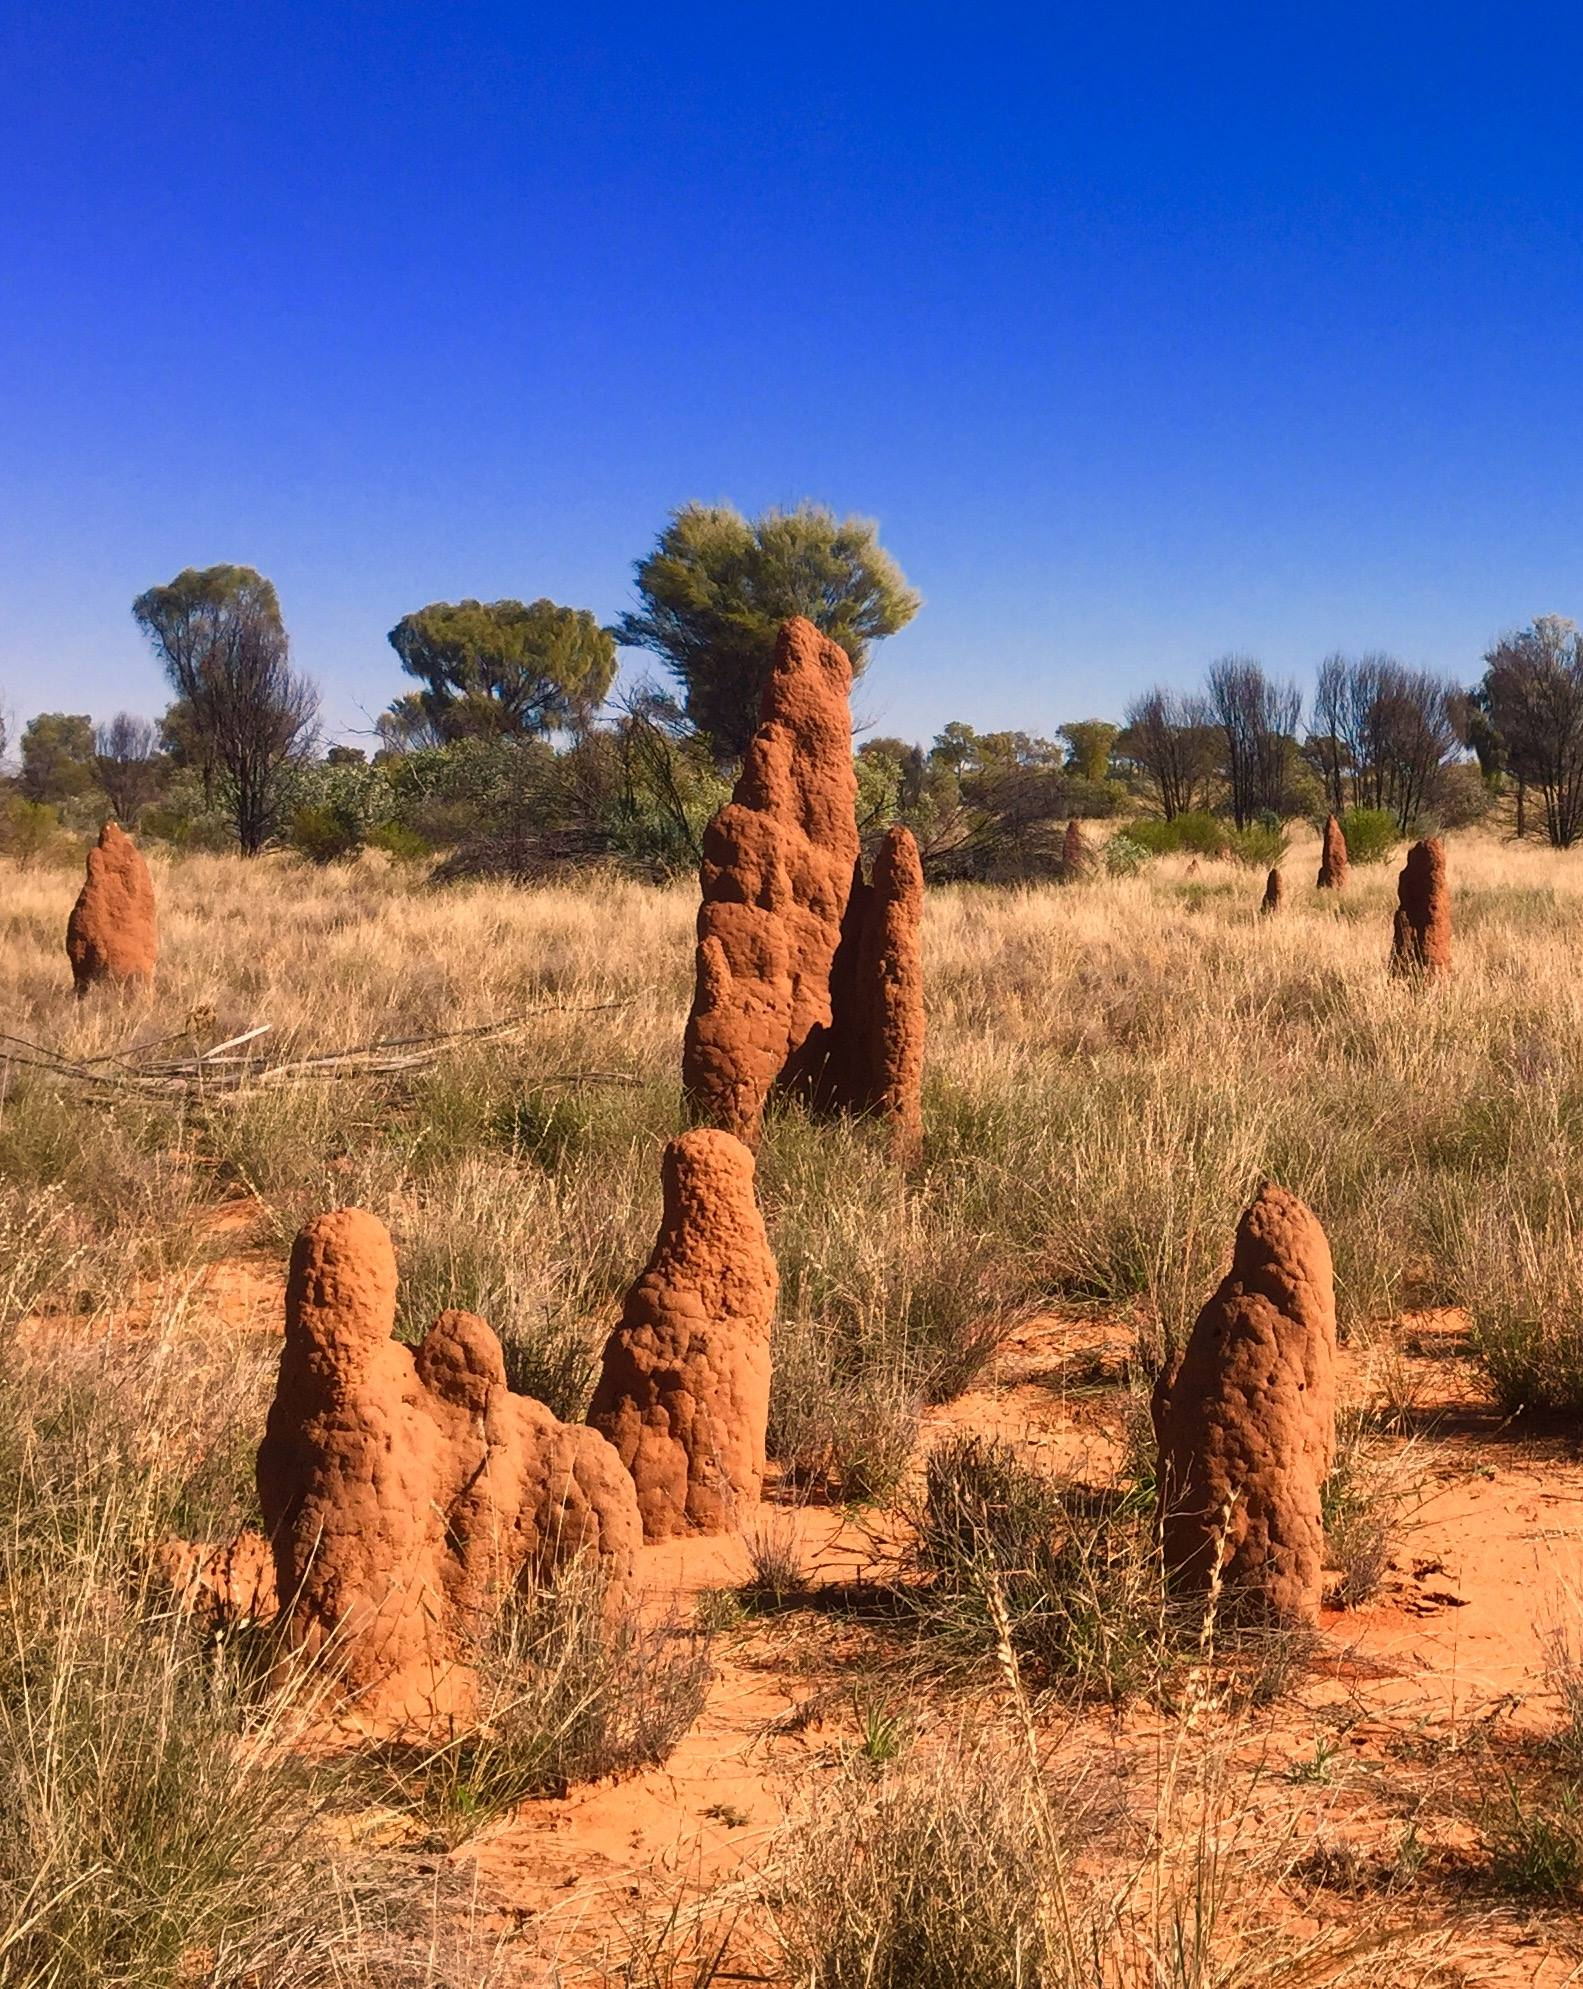 Les termitières élancées avant d'arriver au centre d'art d'Ikuntji. © Photo : Aboriginal Signature • Estrangin Gallery